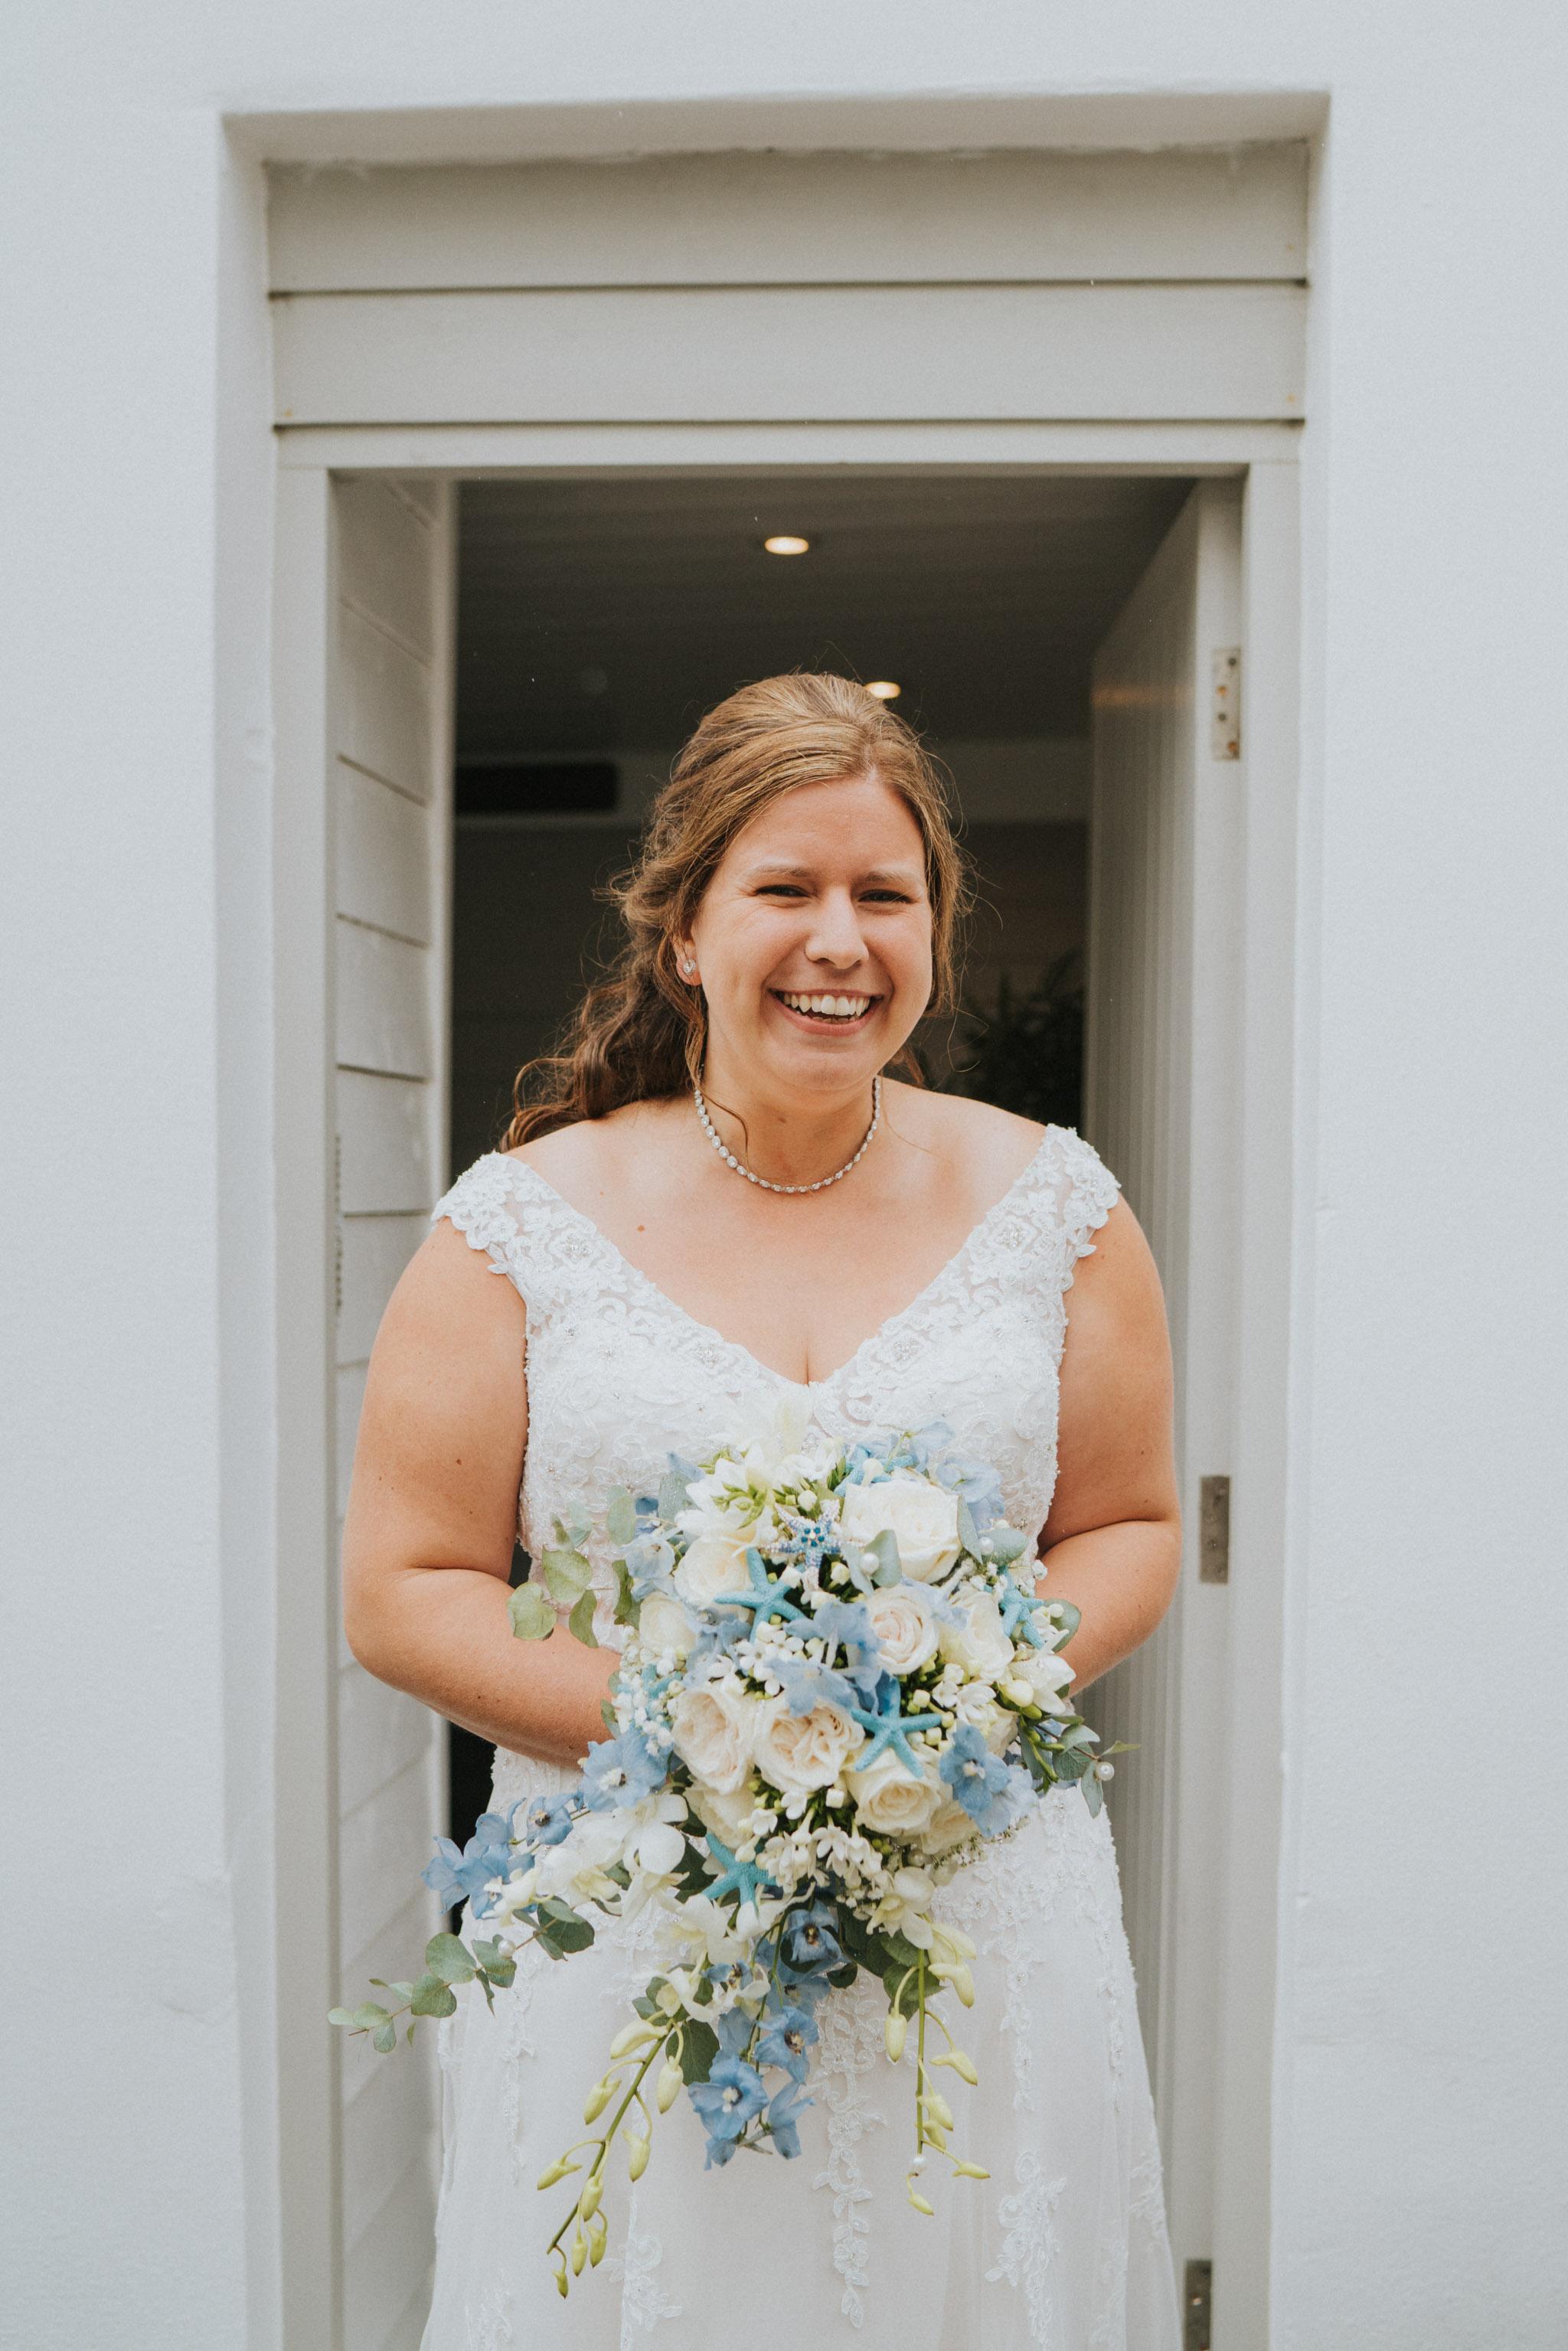 John-Amy-Tunnels-Beaches-Ilfracombe-Devon-Outdoor-Wedding-UK-Colchester-Essex-Alternative-Wedding-Photographer-Grace-Elizabeth (13 of 31).jpg